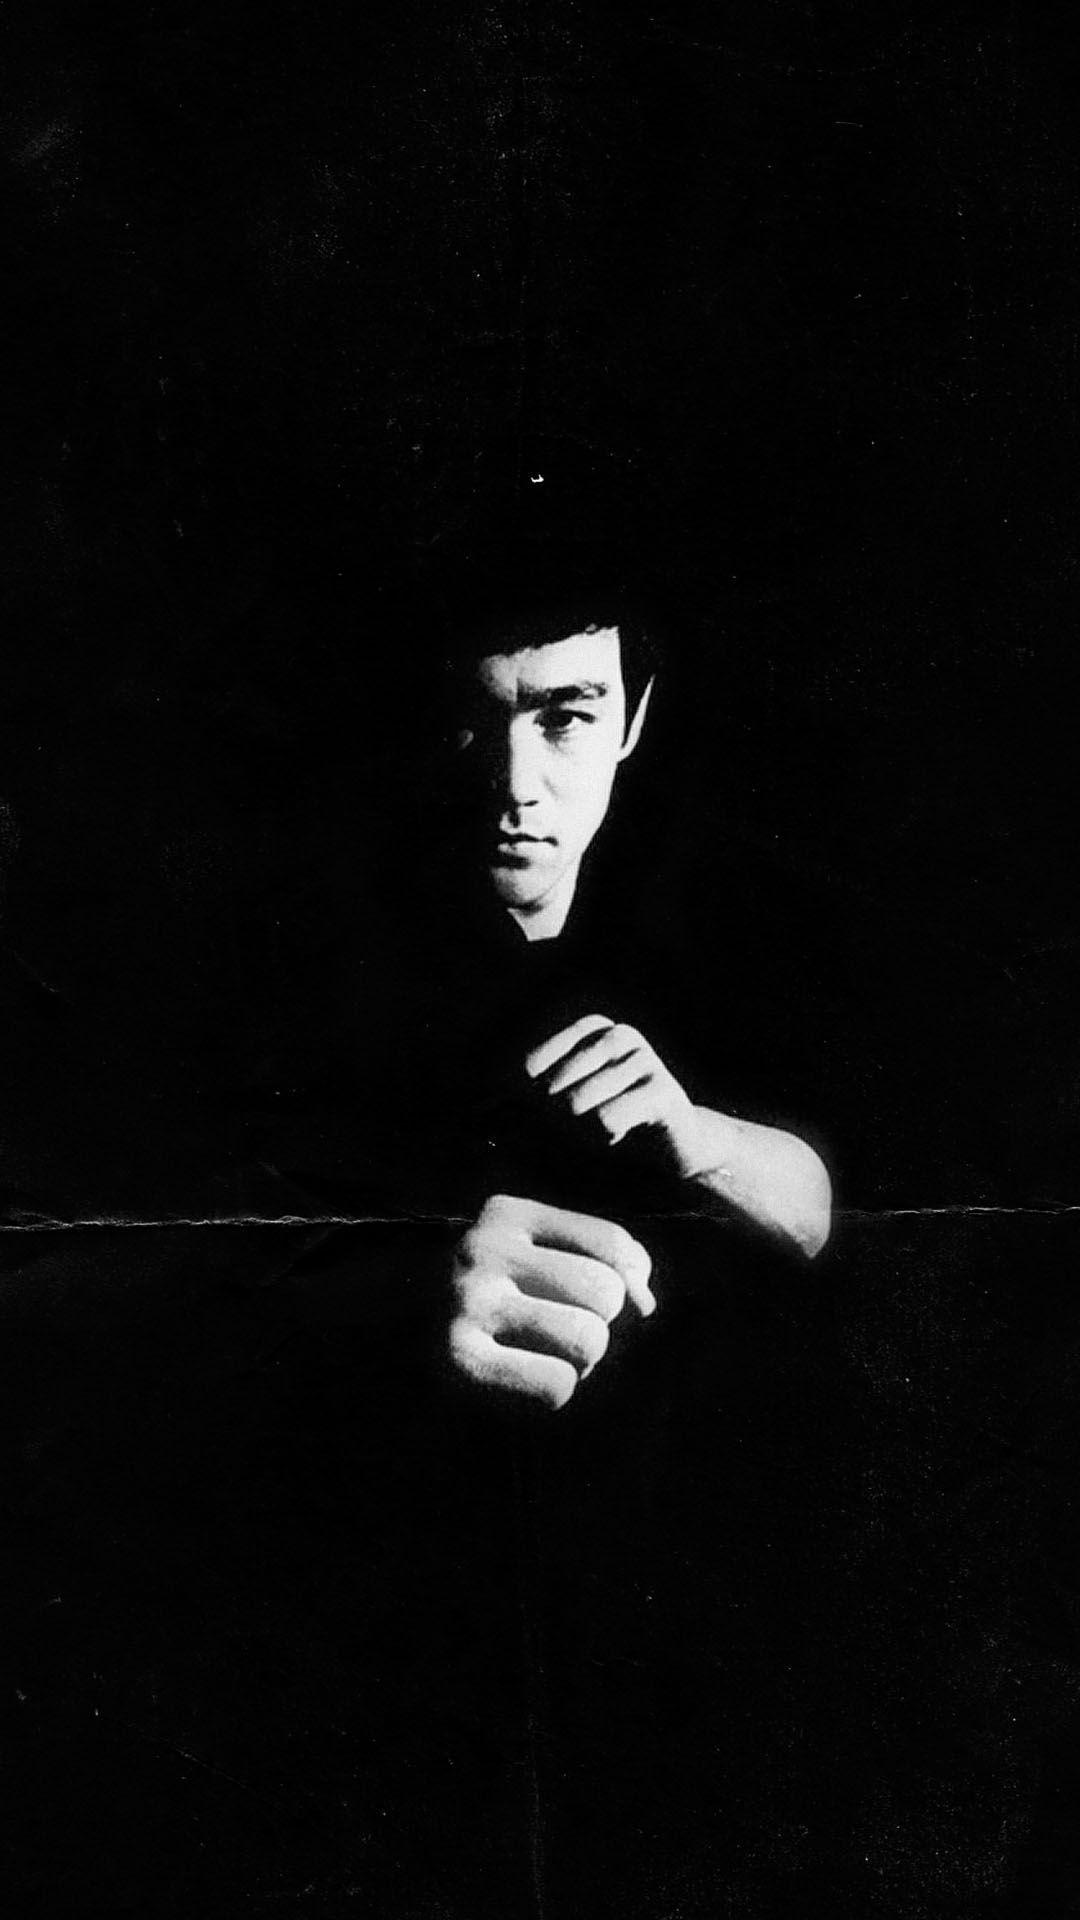 Bruce Lee Android Iphone Desktop Hd Backgrounds Wallpapers 1080p 4k Hdwallpapers Androidwa Bruce Lee Poster Bruce Lee Photos Bruce Lee Art